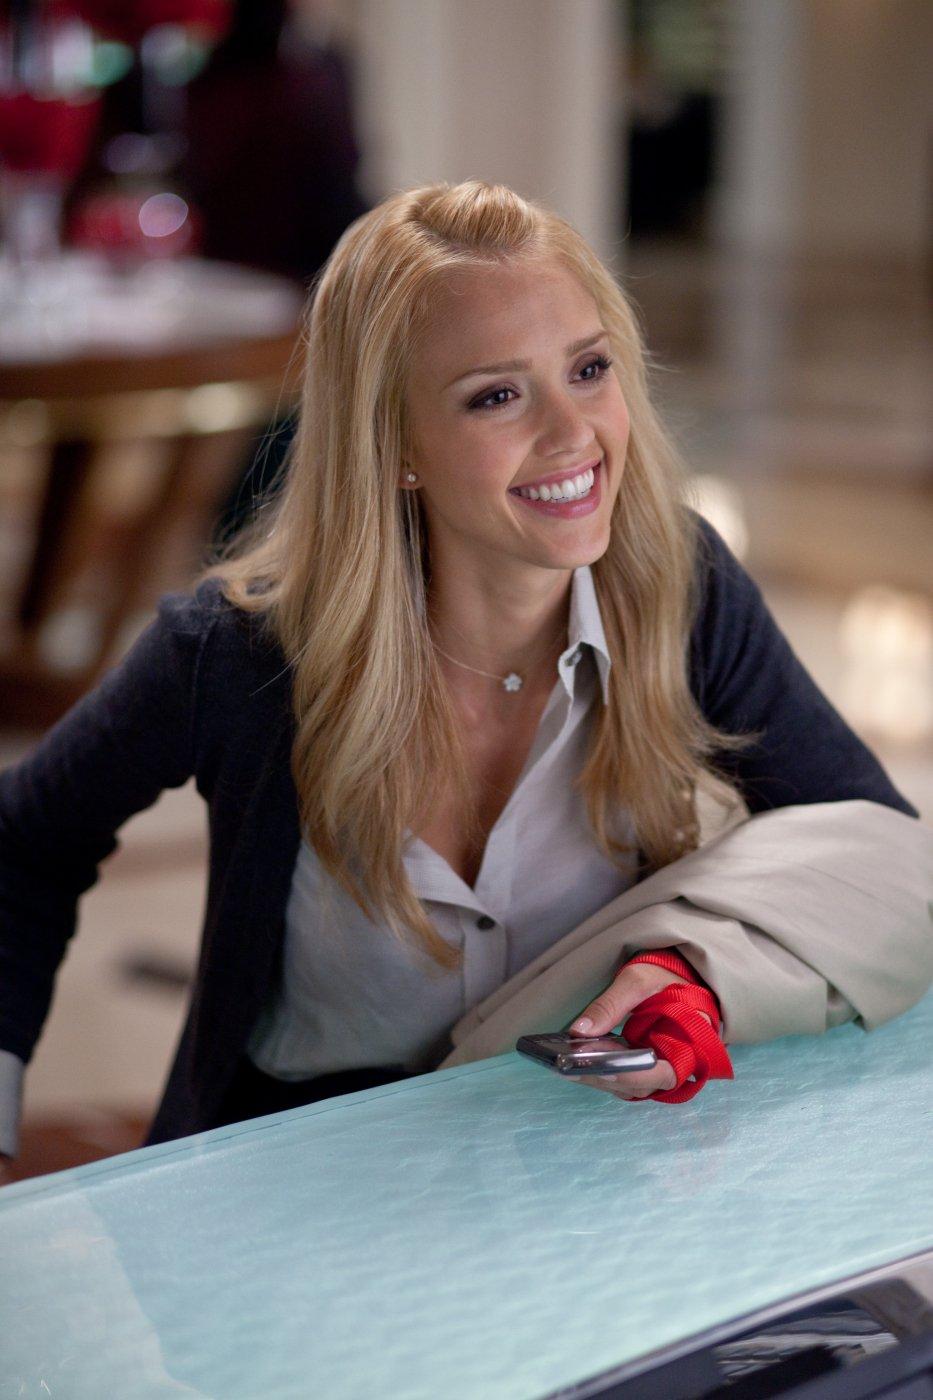 Valentinstag: Amazon.de: Jessica Alba, Kathy Bates, Julia Roberts, Bradley  Cooper, Eric Dane, Patrick Dempsey, Ashton Kutcher, Jamie Foxx, Jennifer  Garner, ...